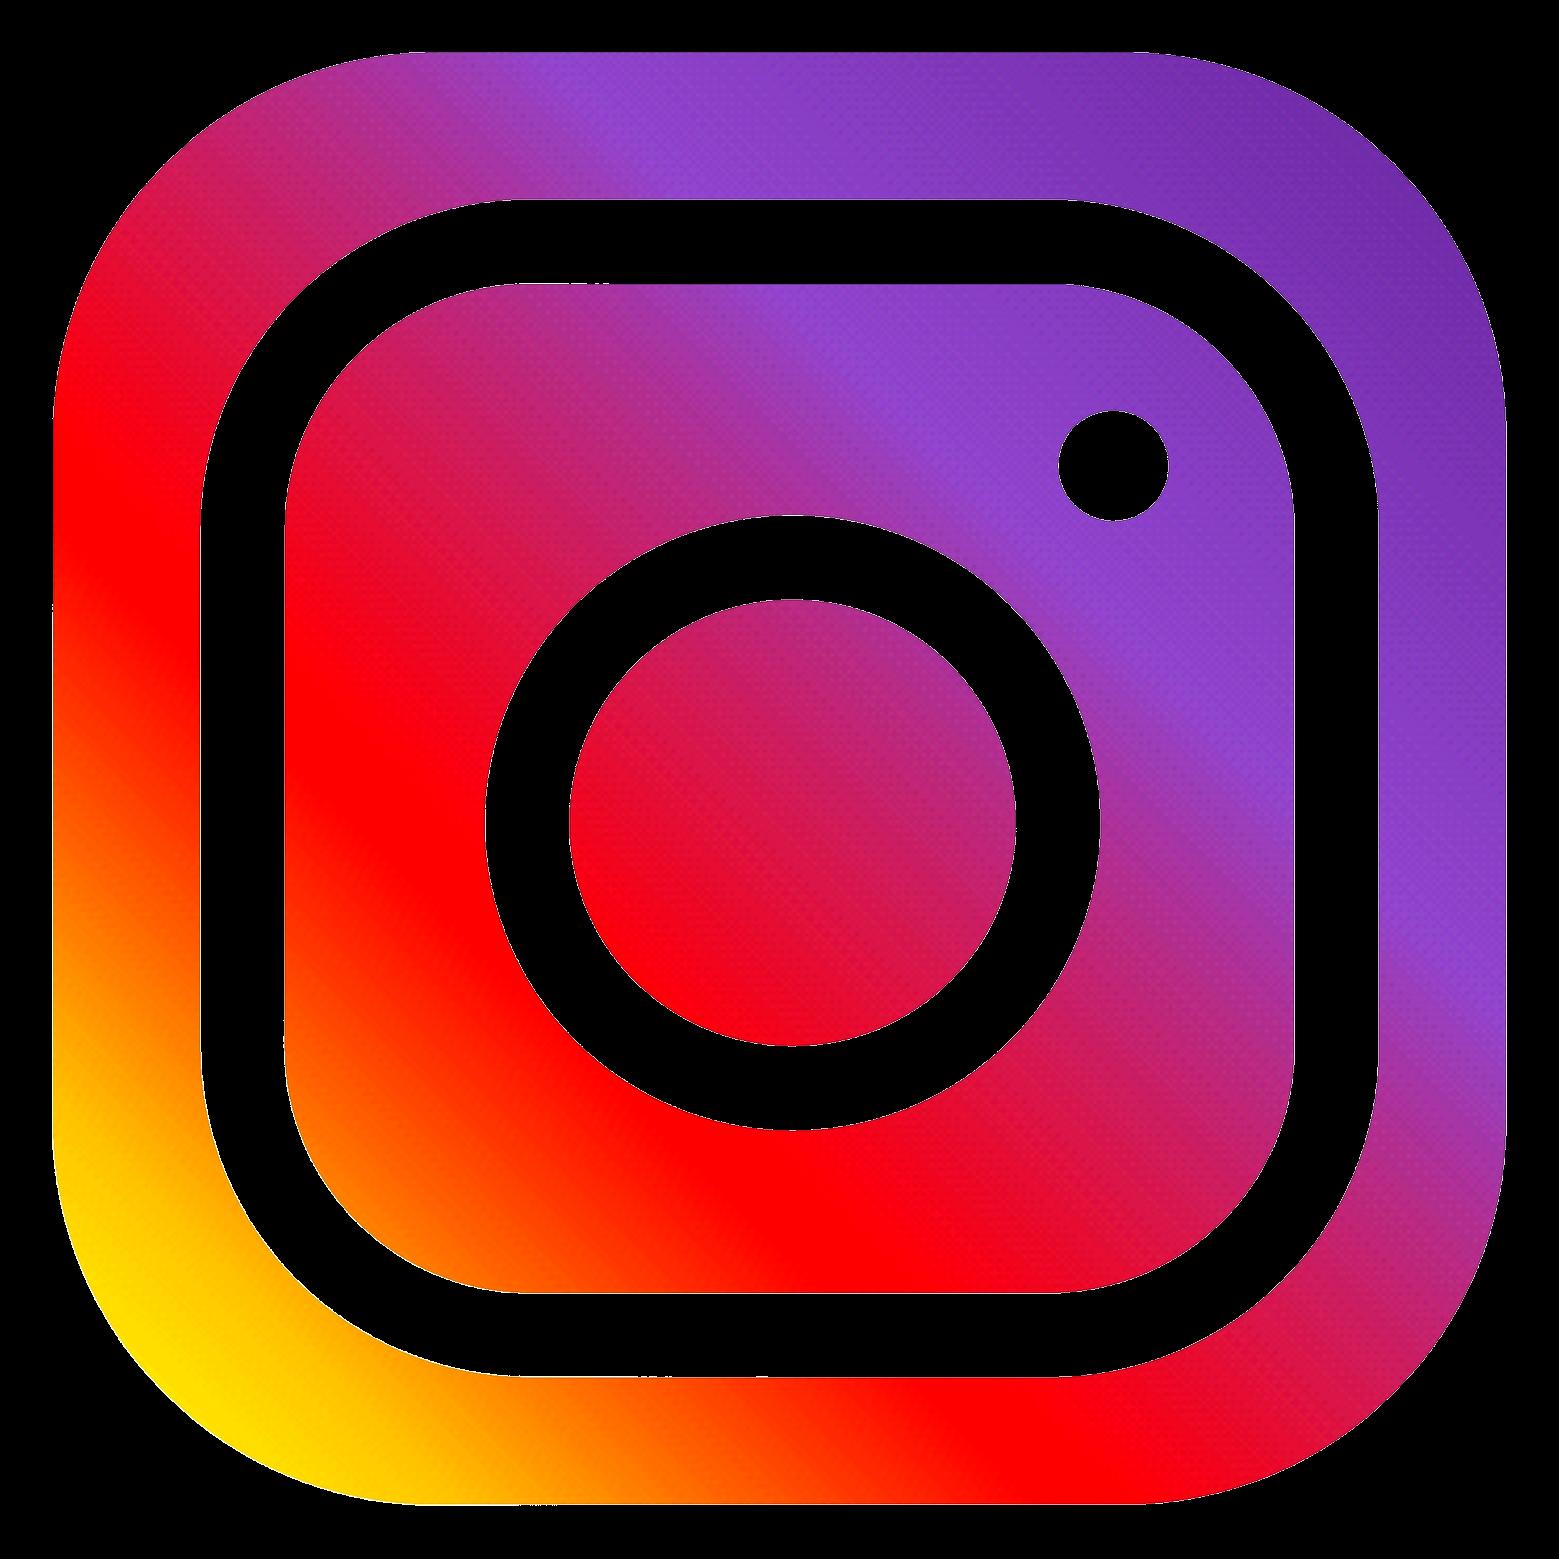 Instagram NEA Network Engineer Academy